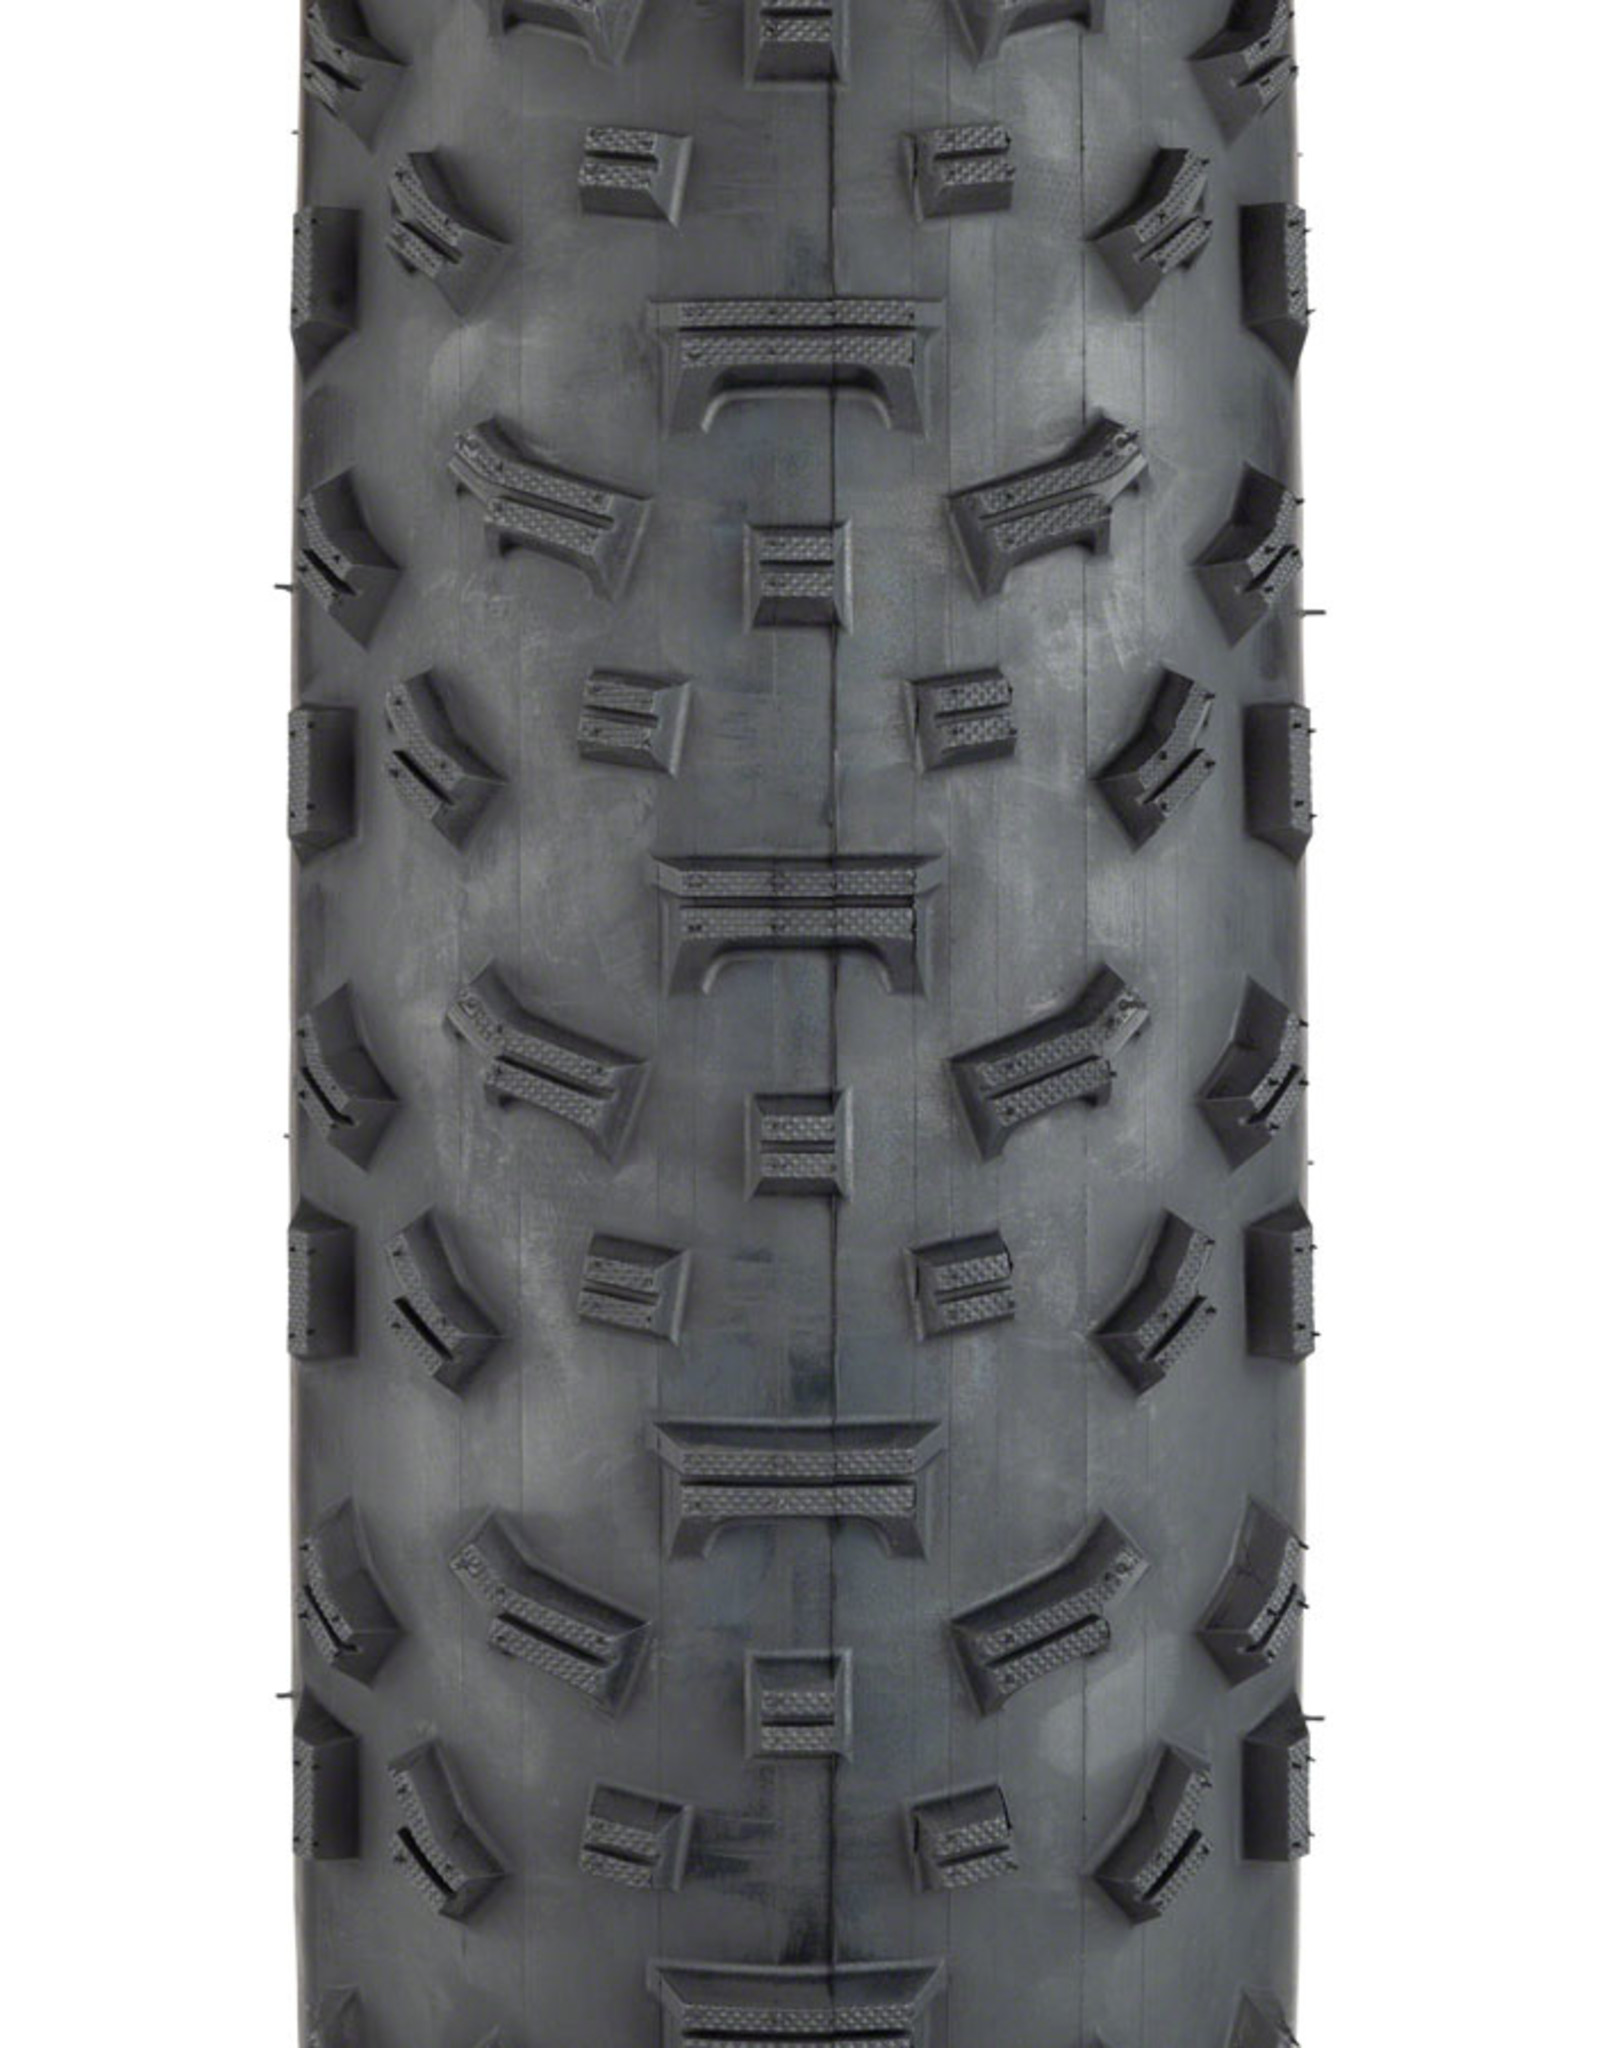 Surly Surly Lou Tire - 26 x 4.8, Tubeless, Folding, Black, 120tpi